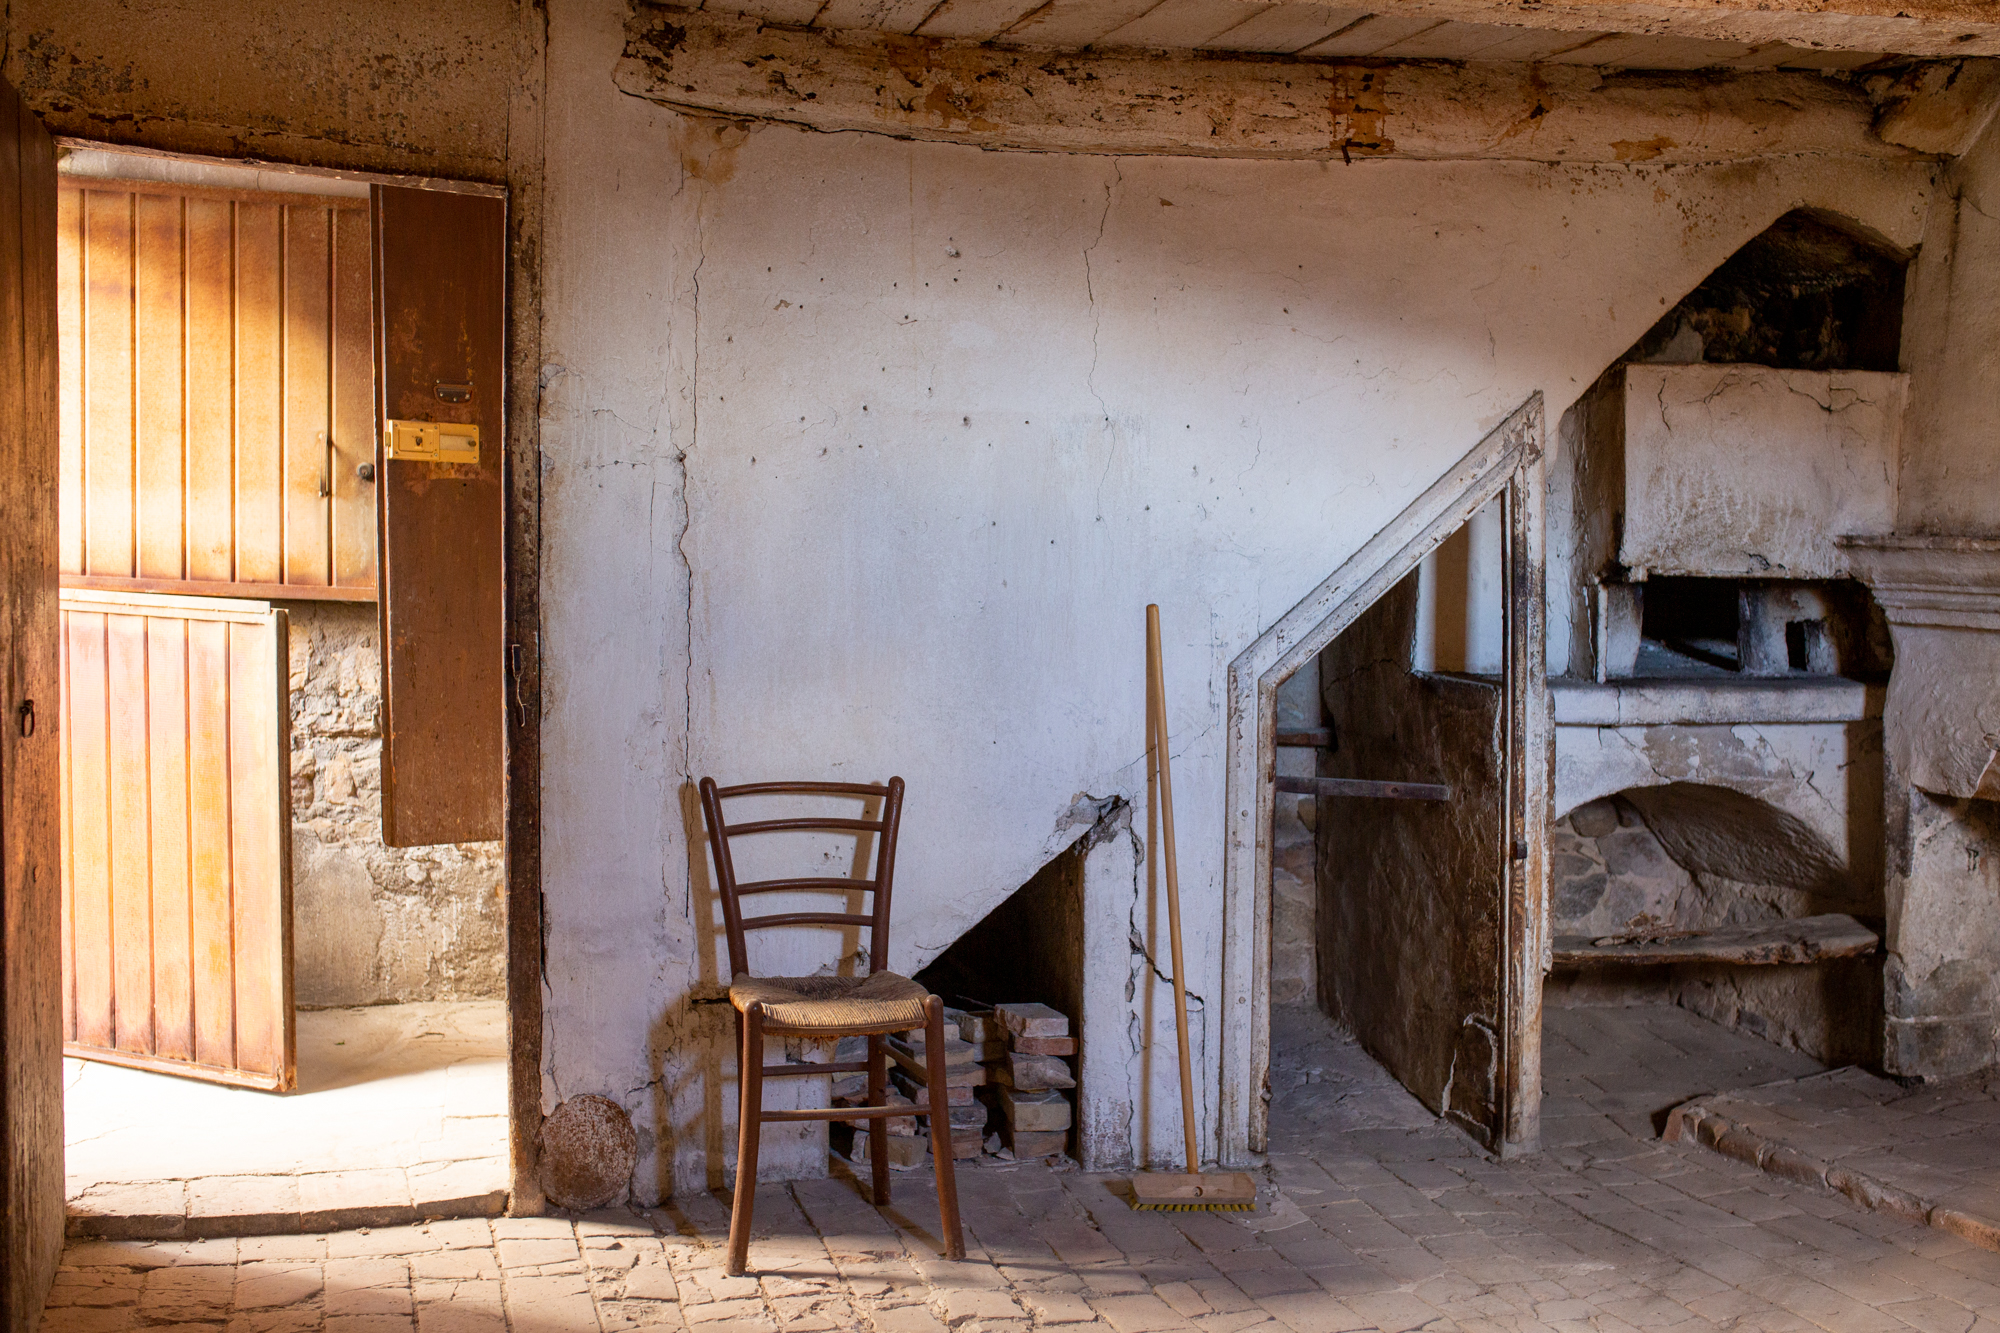 Rif 1207 San Buono – Casa Medievale con vista panoramica – € 13000